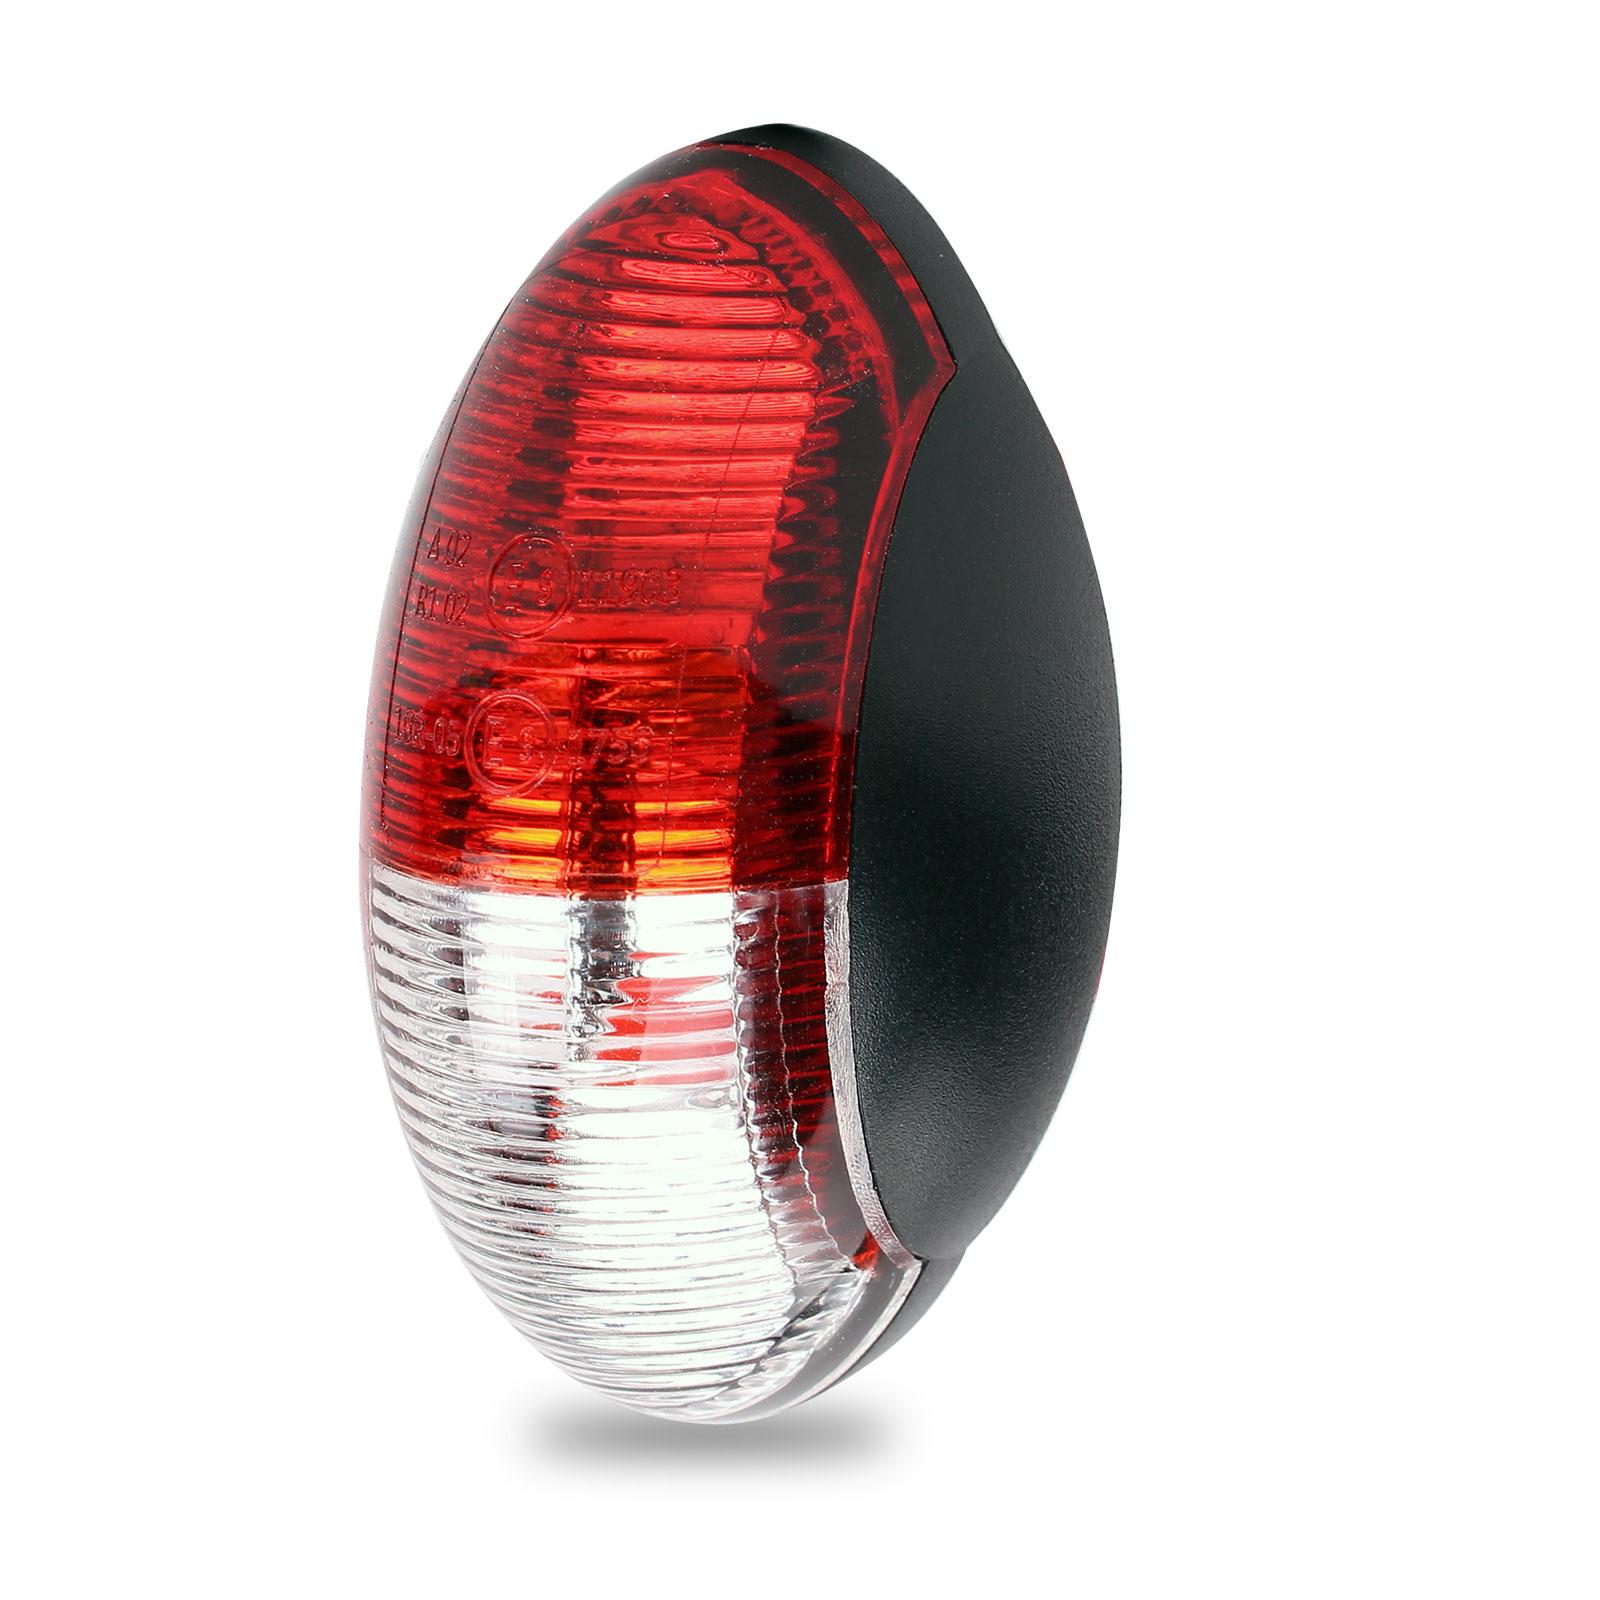 Umrissleuchte LED rot/weiß 60x34 mm, 12 - 30 Volt, LED